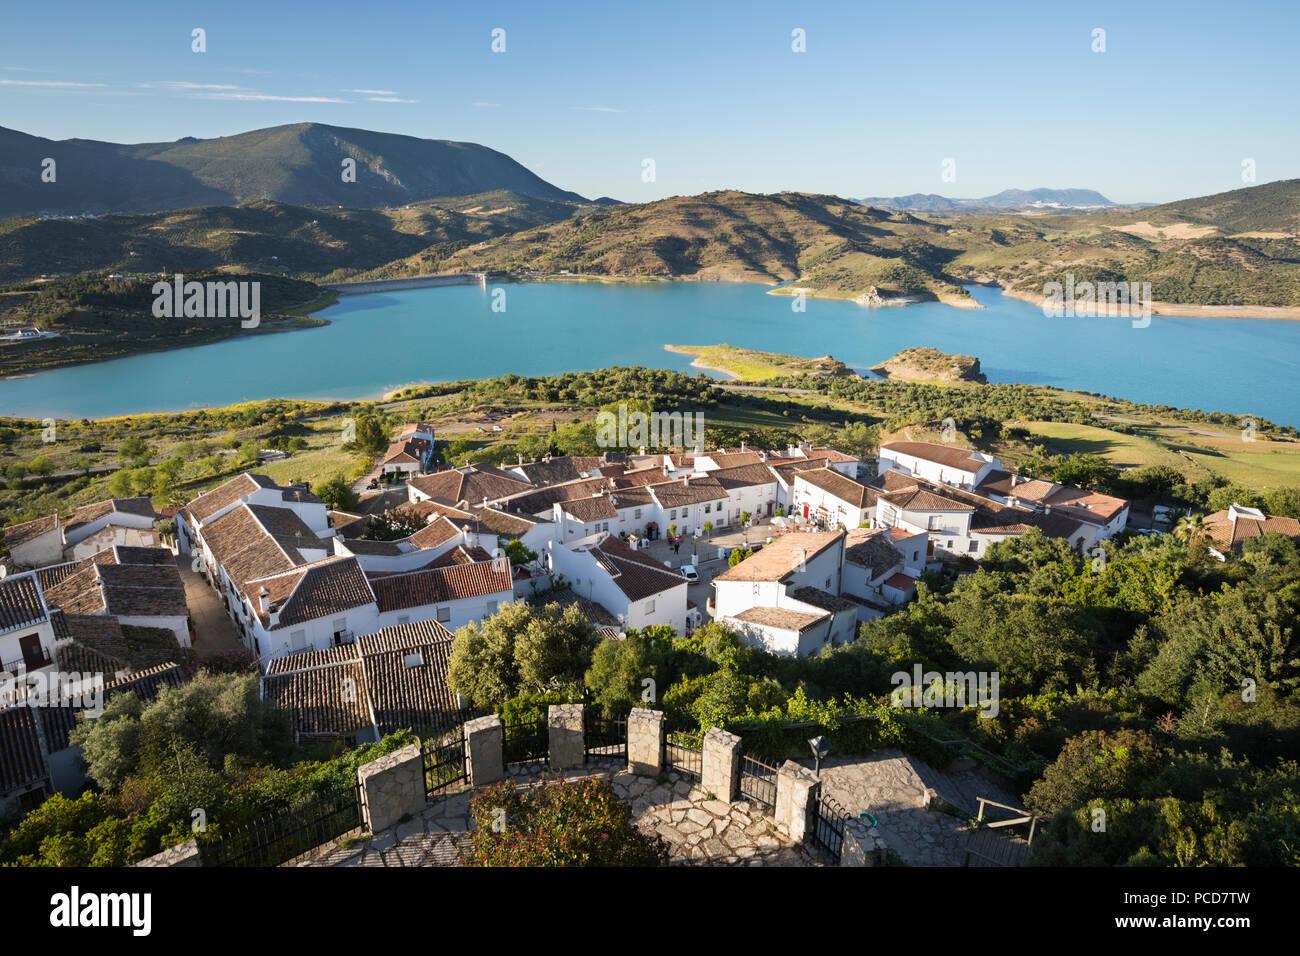 View of white village and turquoise coloured reservoir, Zahara de la Sierra, Sierra de Grazalema Natural Park, Andalucia, Spain, Europe - Stock Image